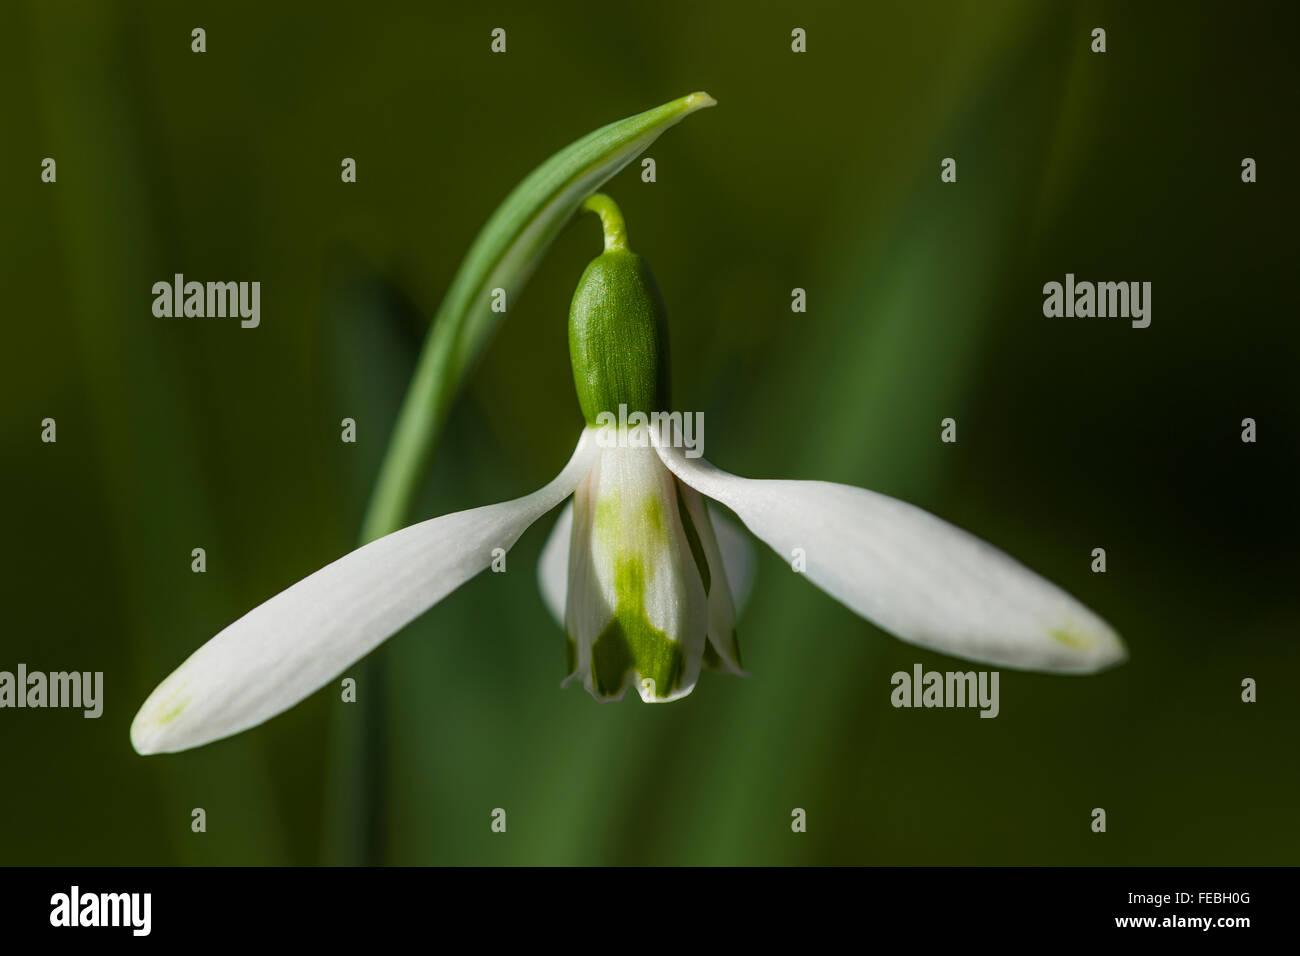 Galanthus nivalis 'Daphne's Scissors' - Stock Image